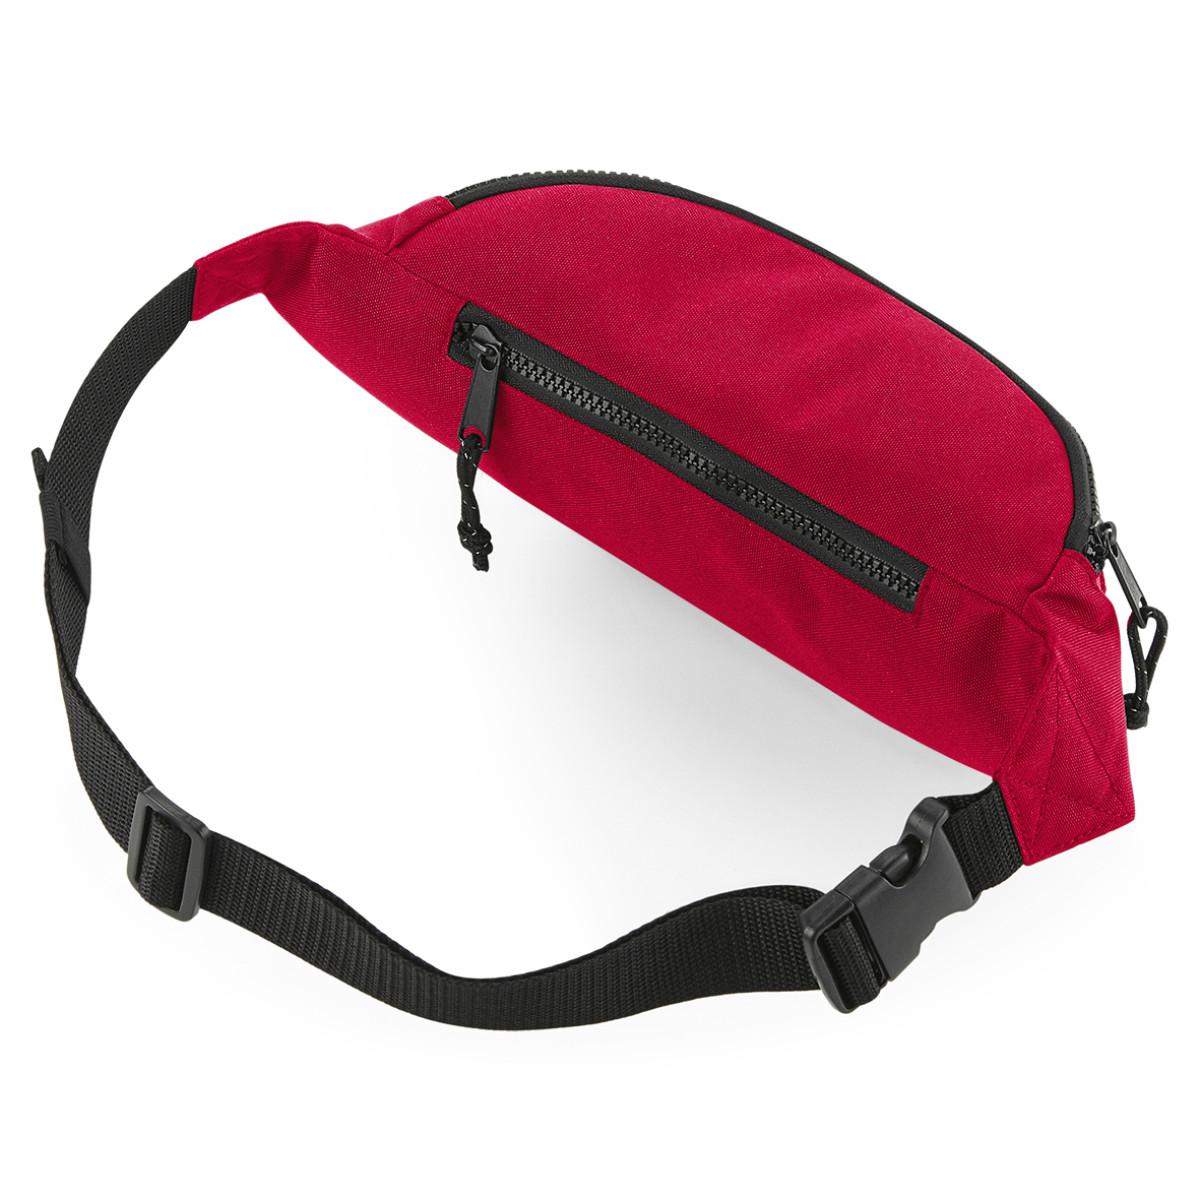 Bagbase Recycled Waistpack